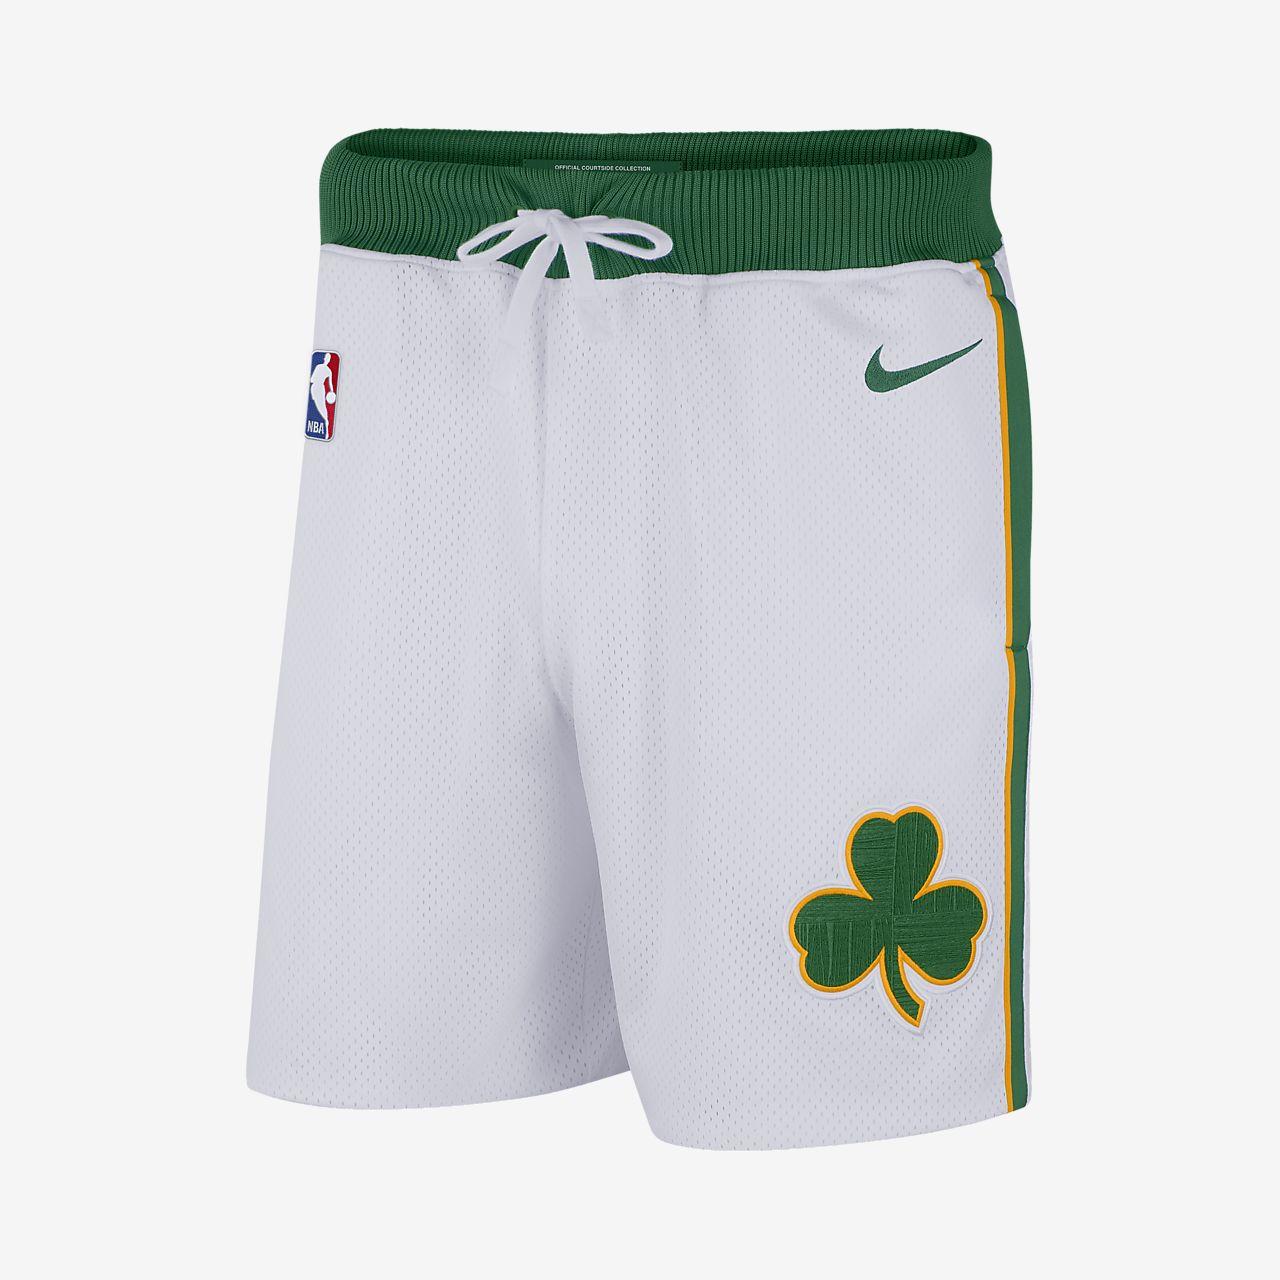 Short NBA Boston Celtics Nike Courtside pour Homme